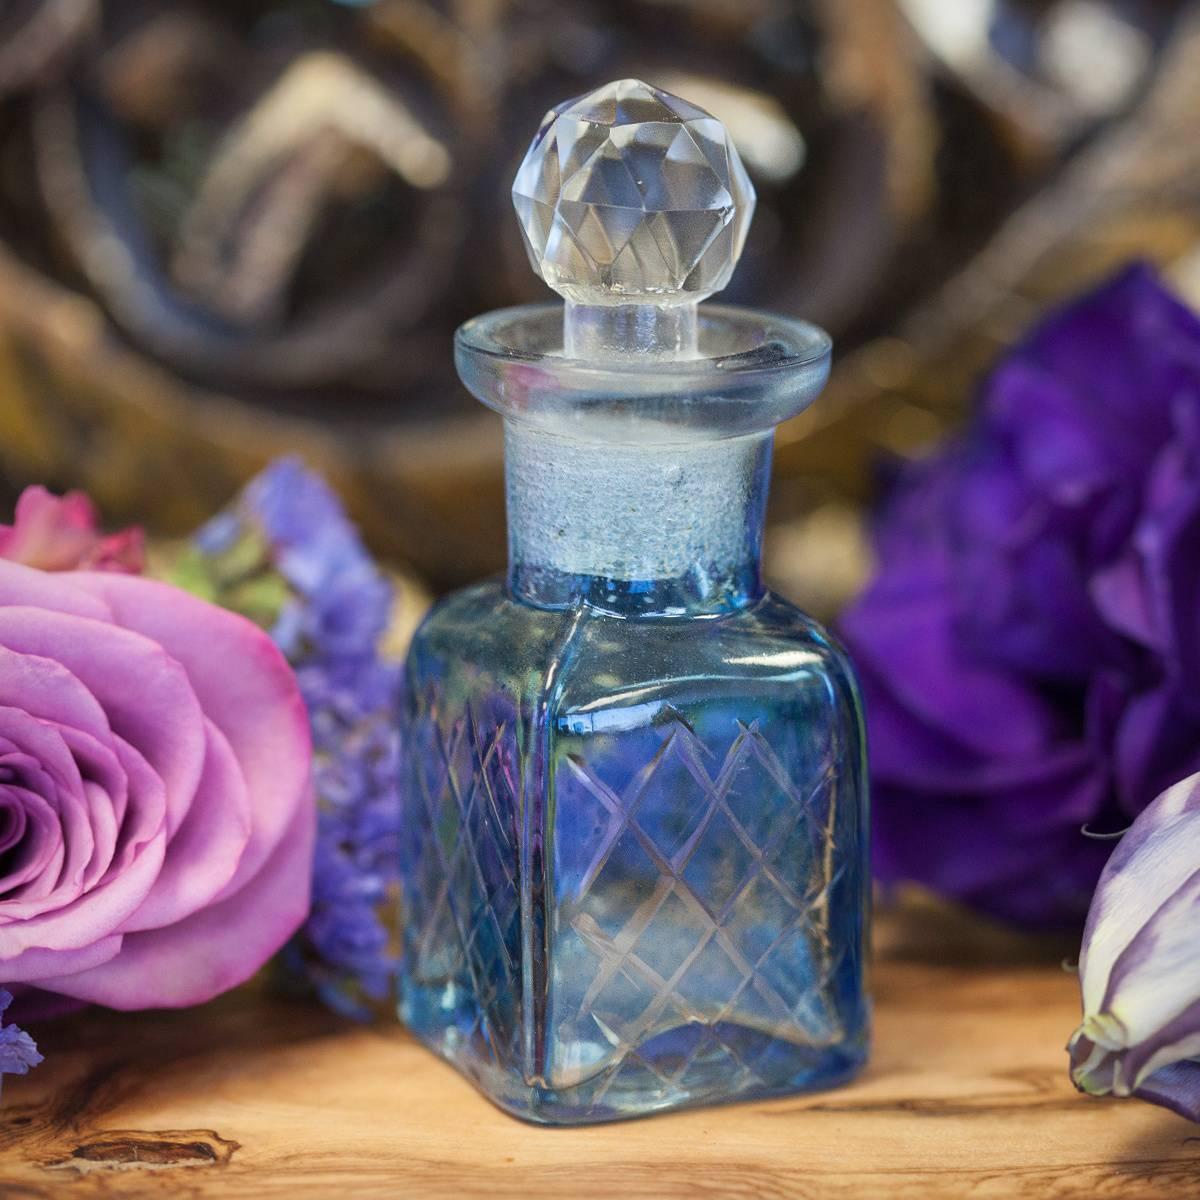 Sagrada_Perfume_with_Apothecary_Bottle_3of3_7_15